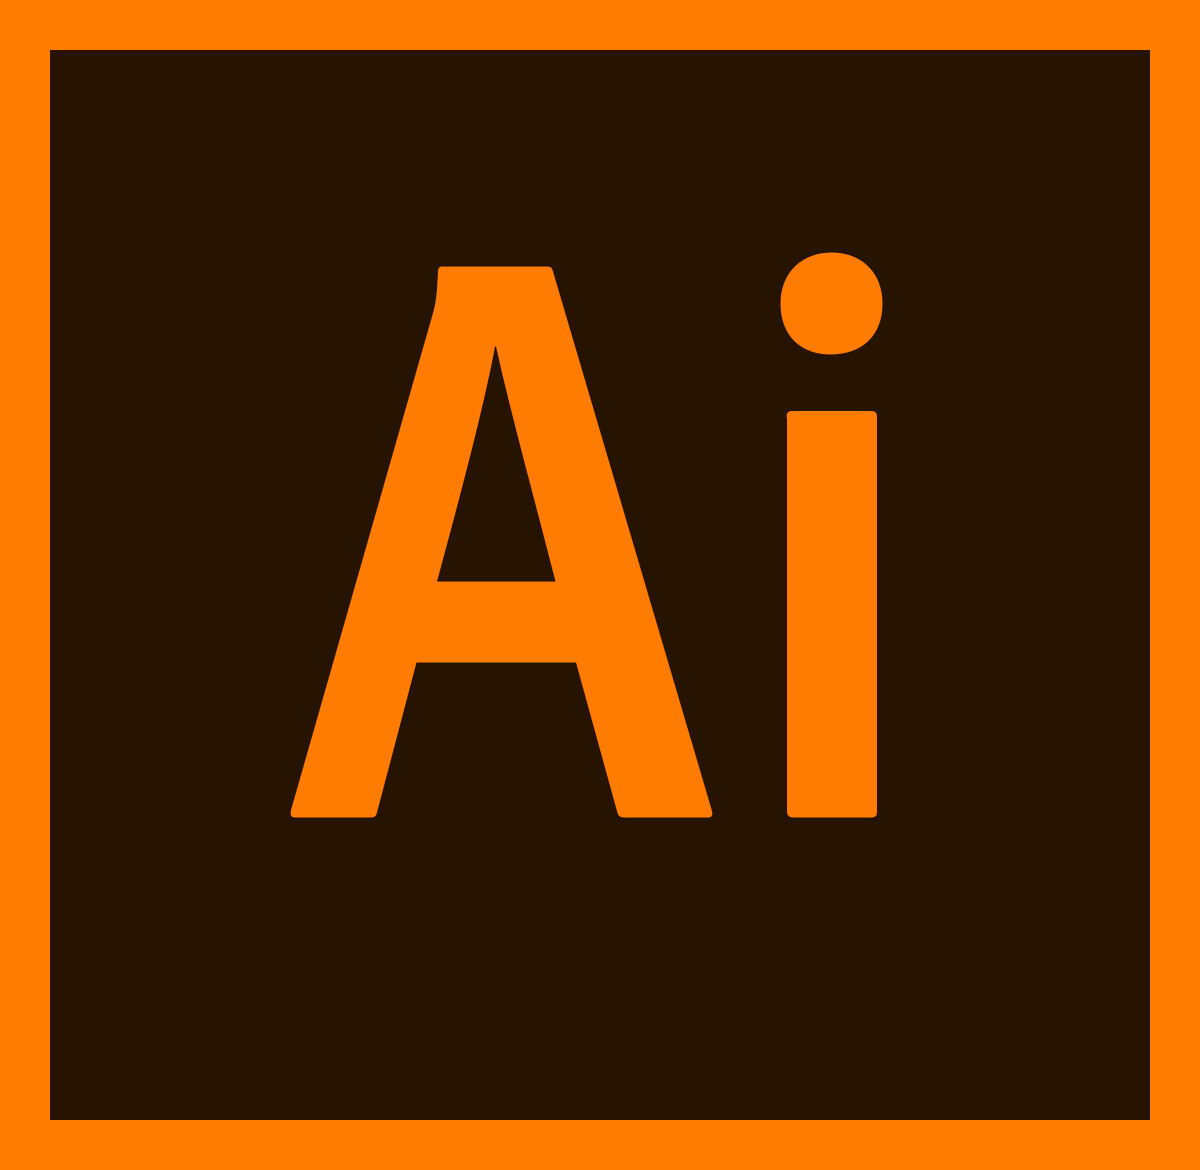 Adobe Illustrator CC 23.0.1 Full Version for Windows